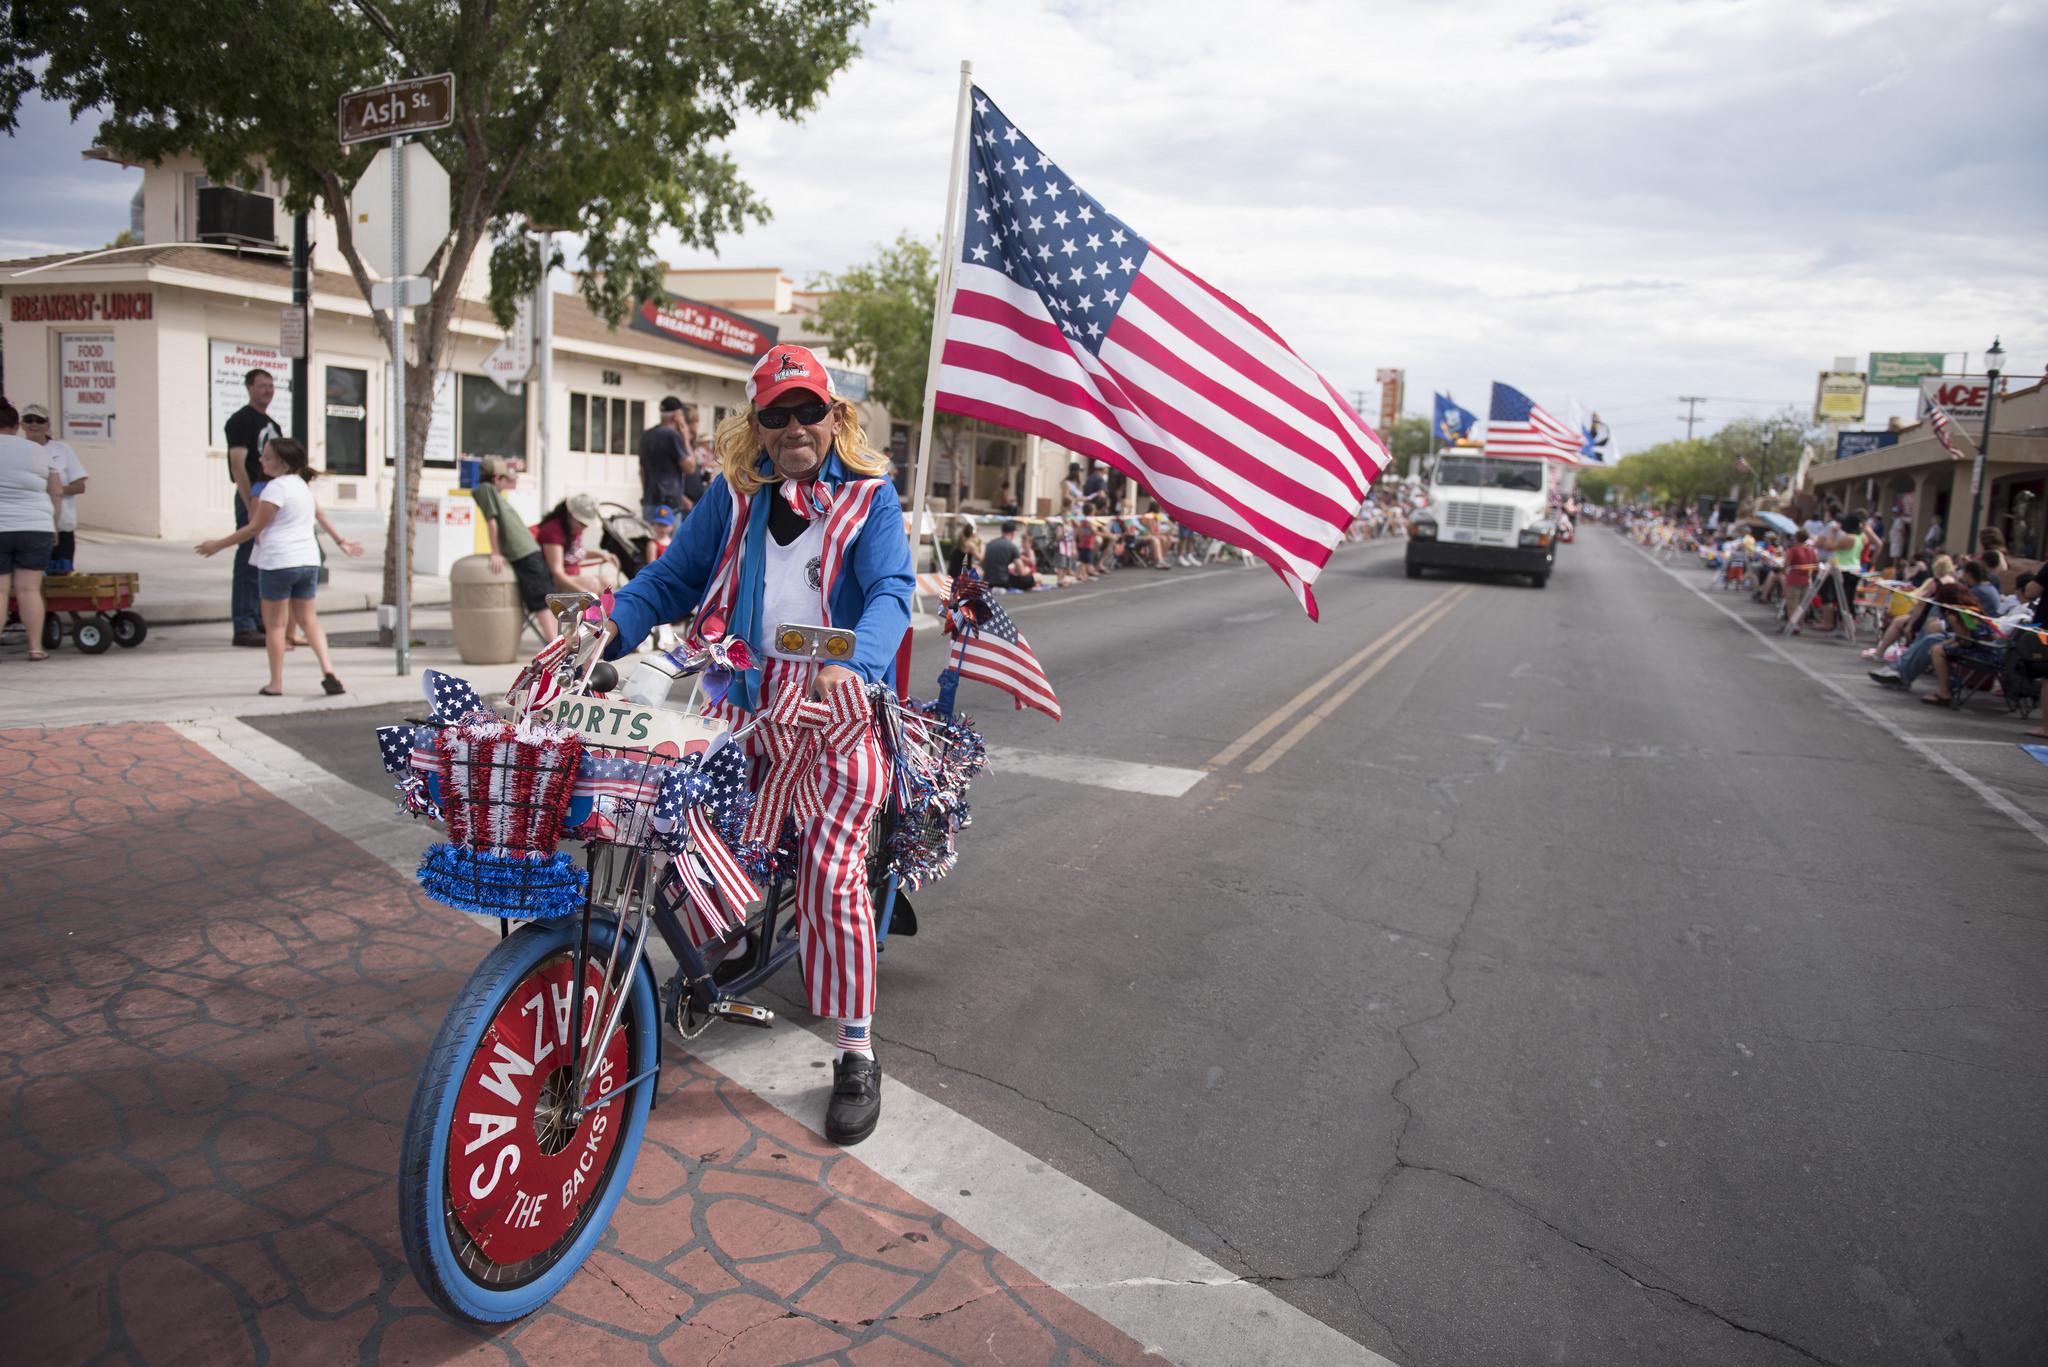 Casimer Kusak rides his bike in the Fourth of July parade at the 67th Annual Boulder City Damboree Celebration in Boulder City, Saturday, July 4, 2015. (JASON OGULNIK/BOULDER CITY REVIEW)